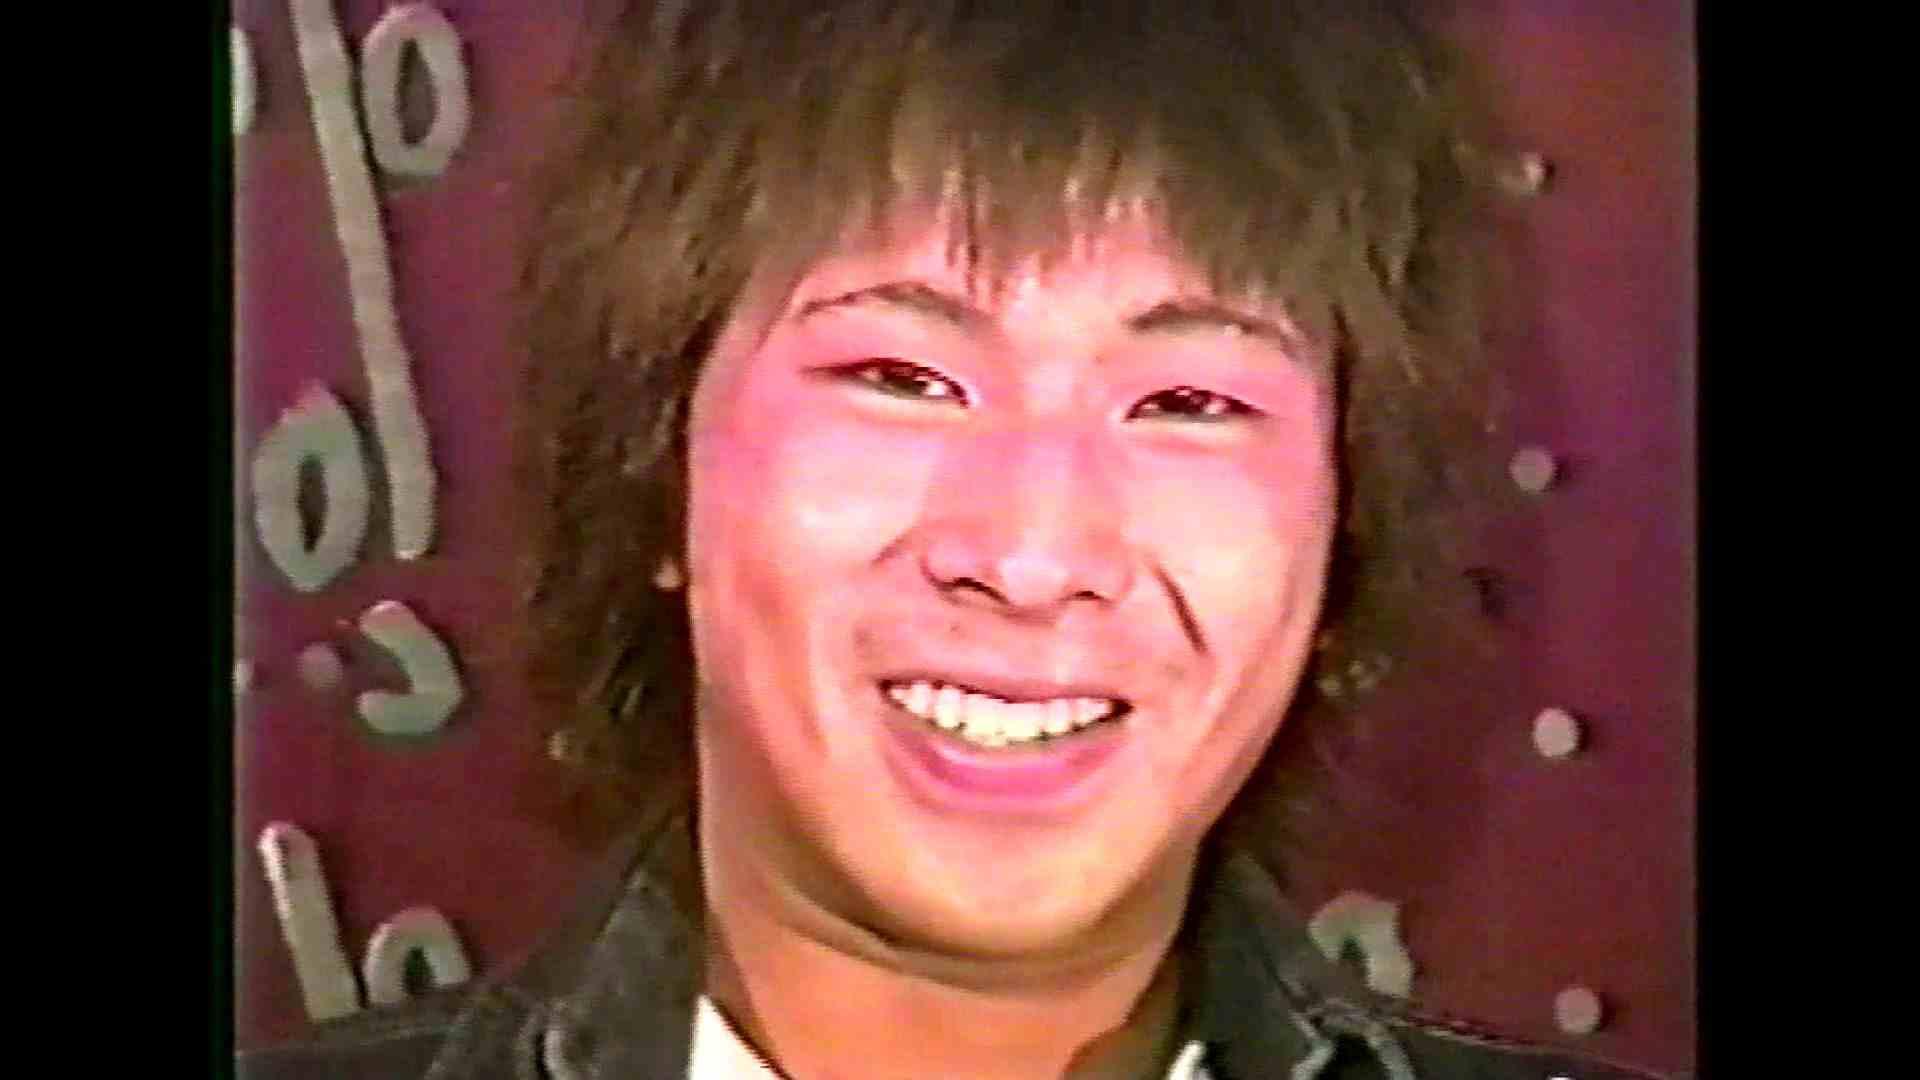 GAYBOY宏のオカズ倉庫Vol.3-1 完全無修正  89pic 37